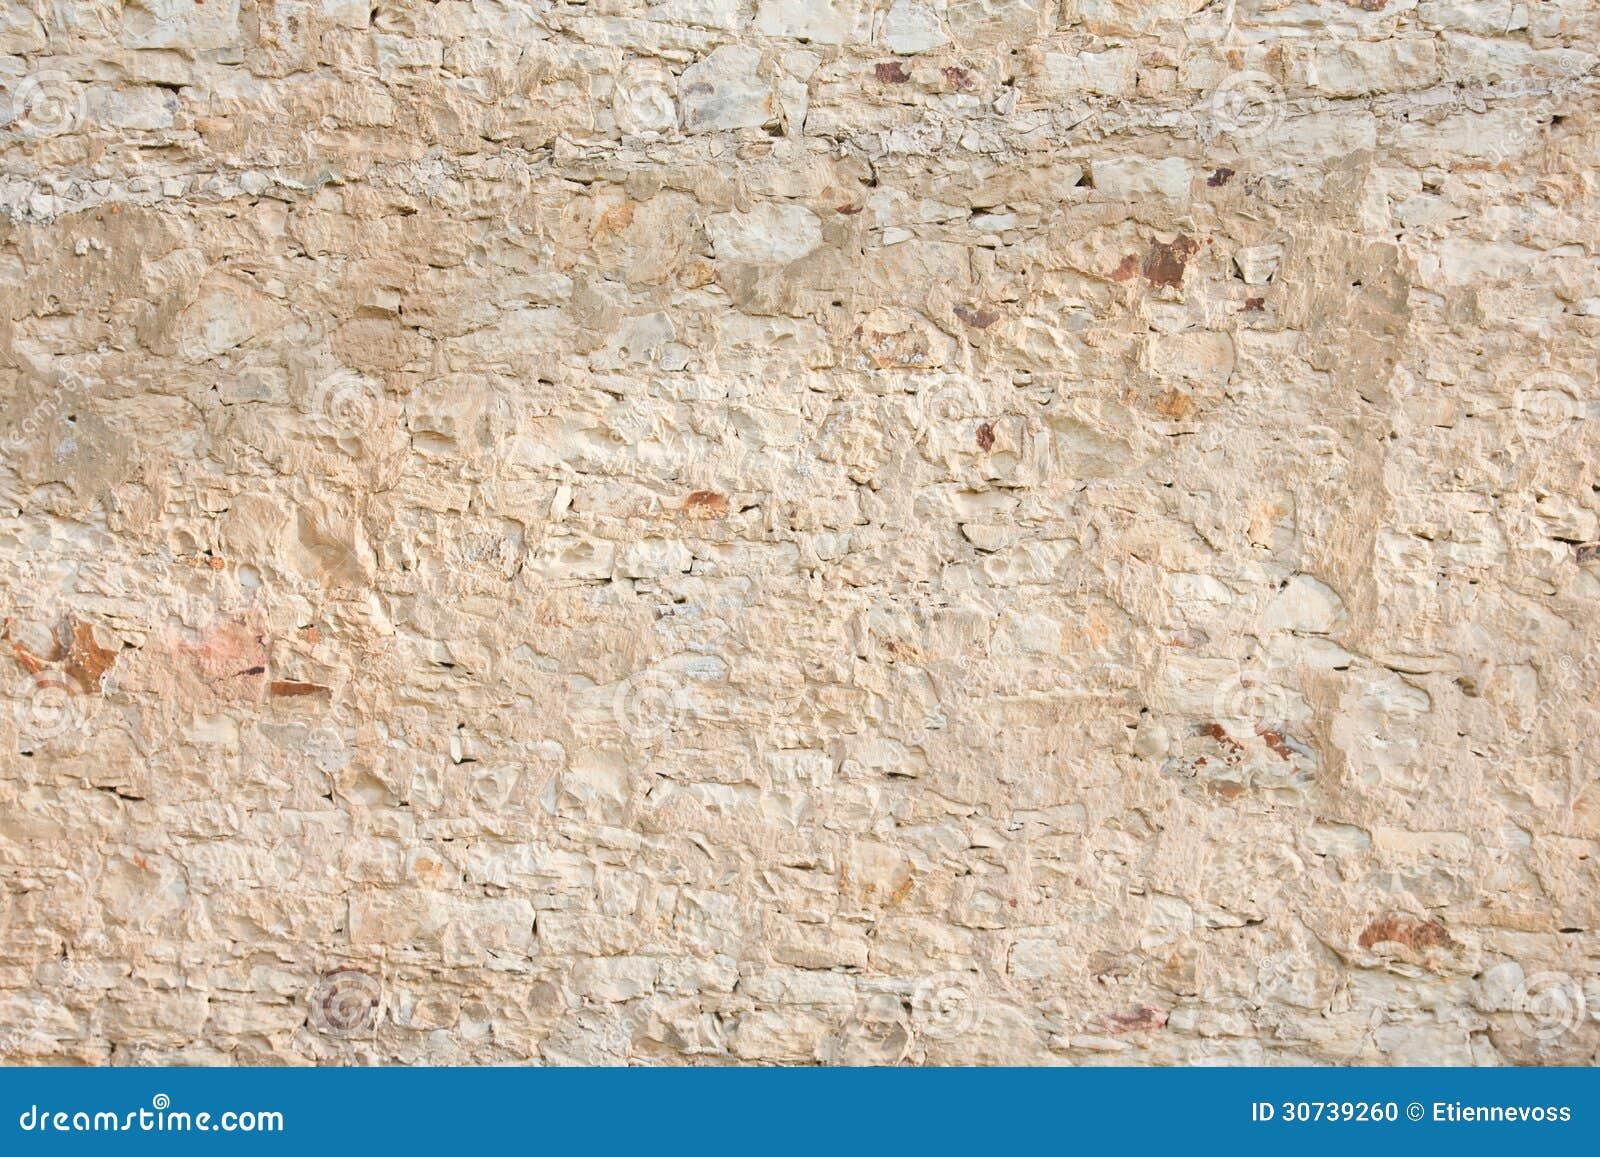 Fondo pared rustica